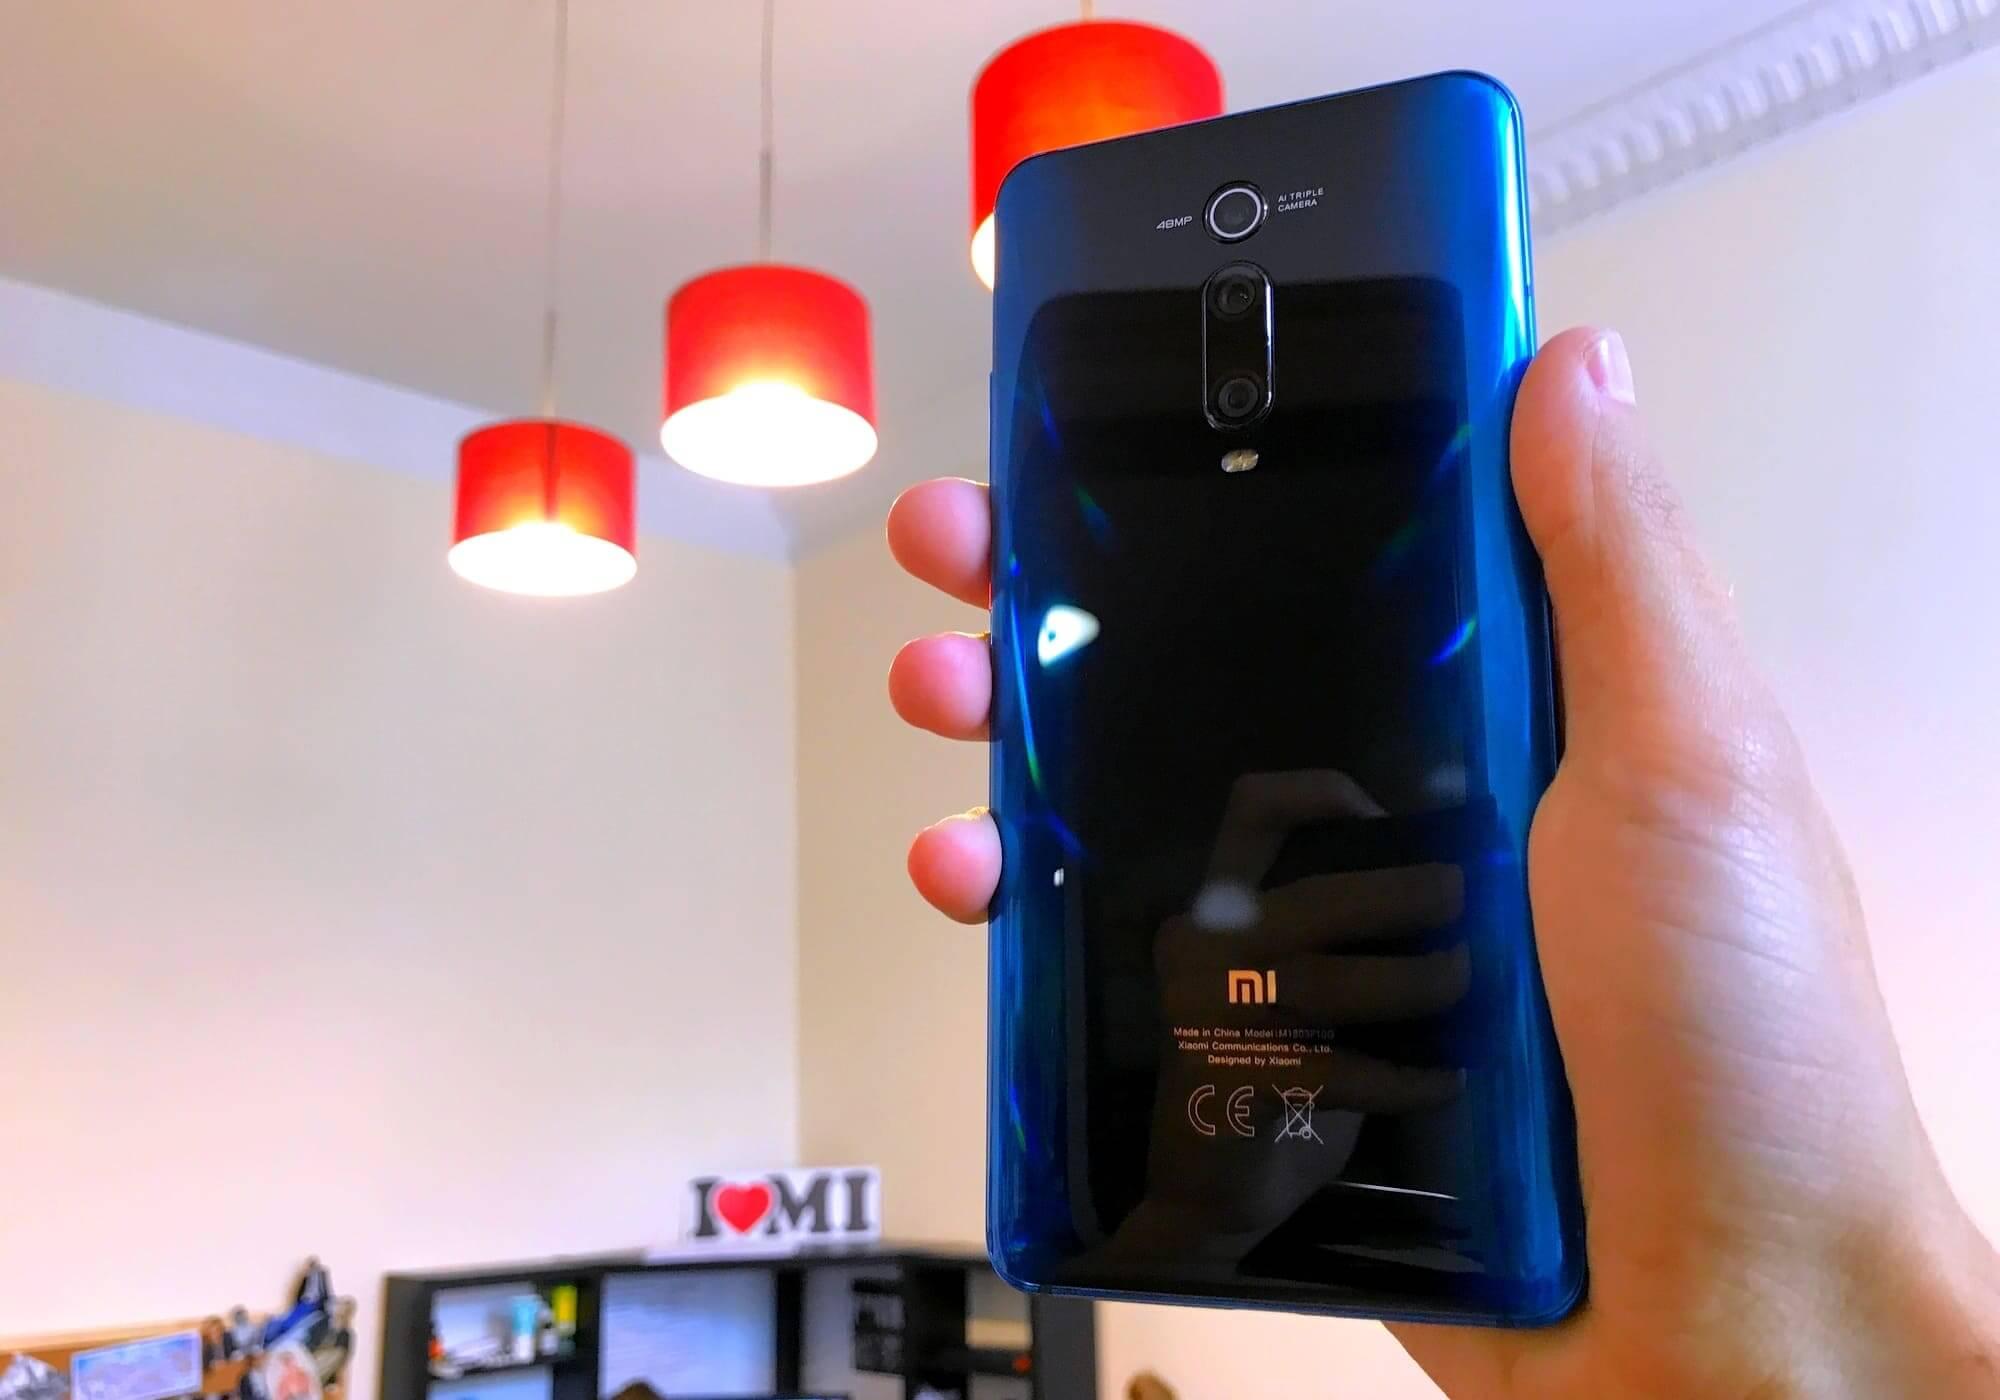 Xiaomi Mi 9T Pro – обзор смартфона с выдвижной камерой xiaomi mi 9t pro,обзор,смартфоны,технологии,флагман